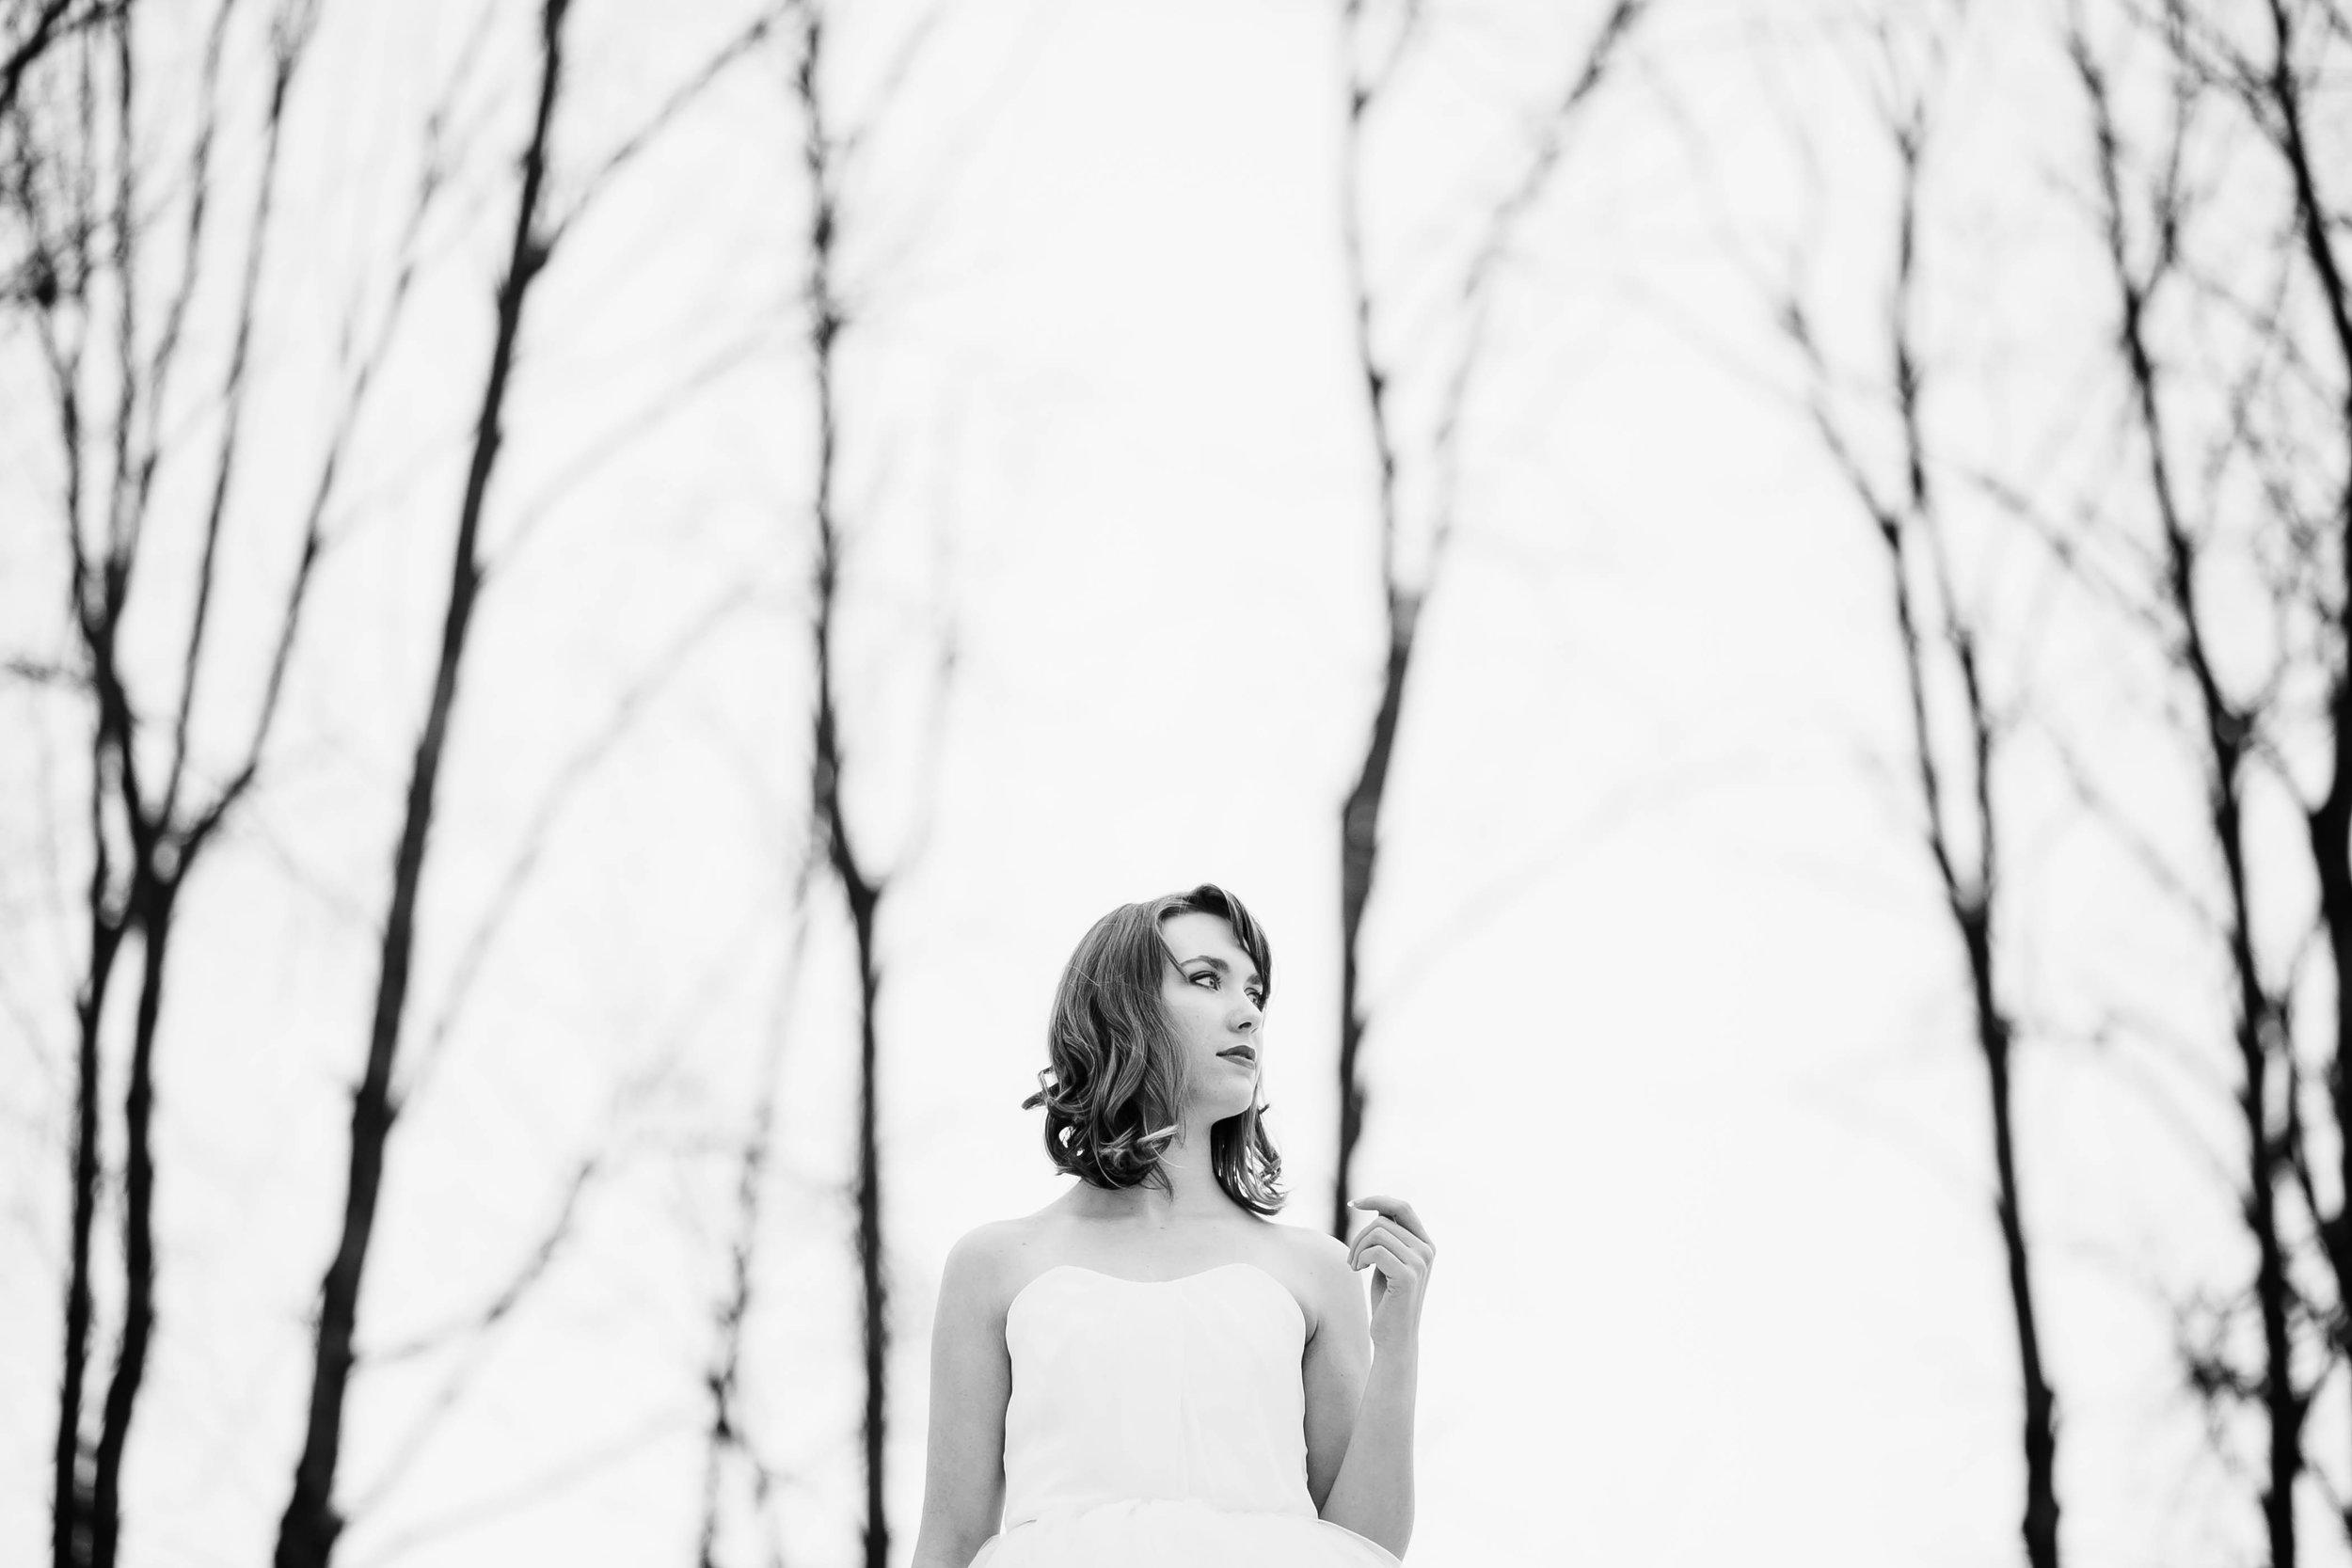 SarahSovereignPhotography_KateFairley (3).jpg